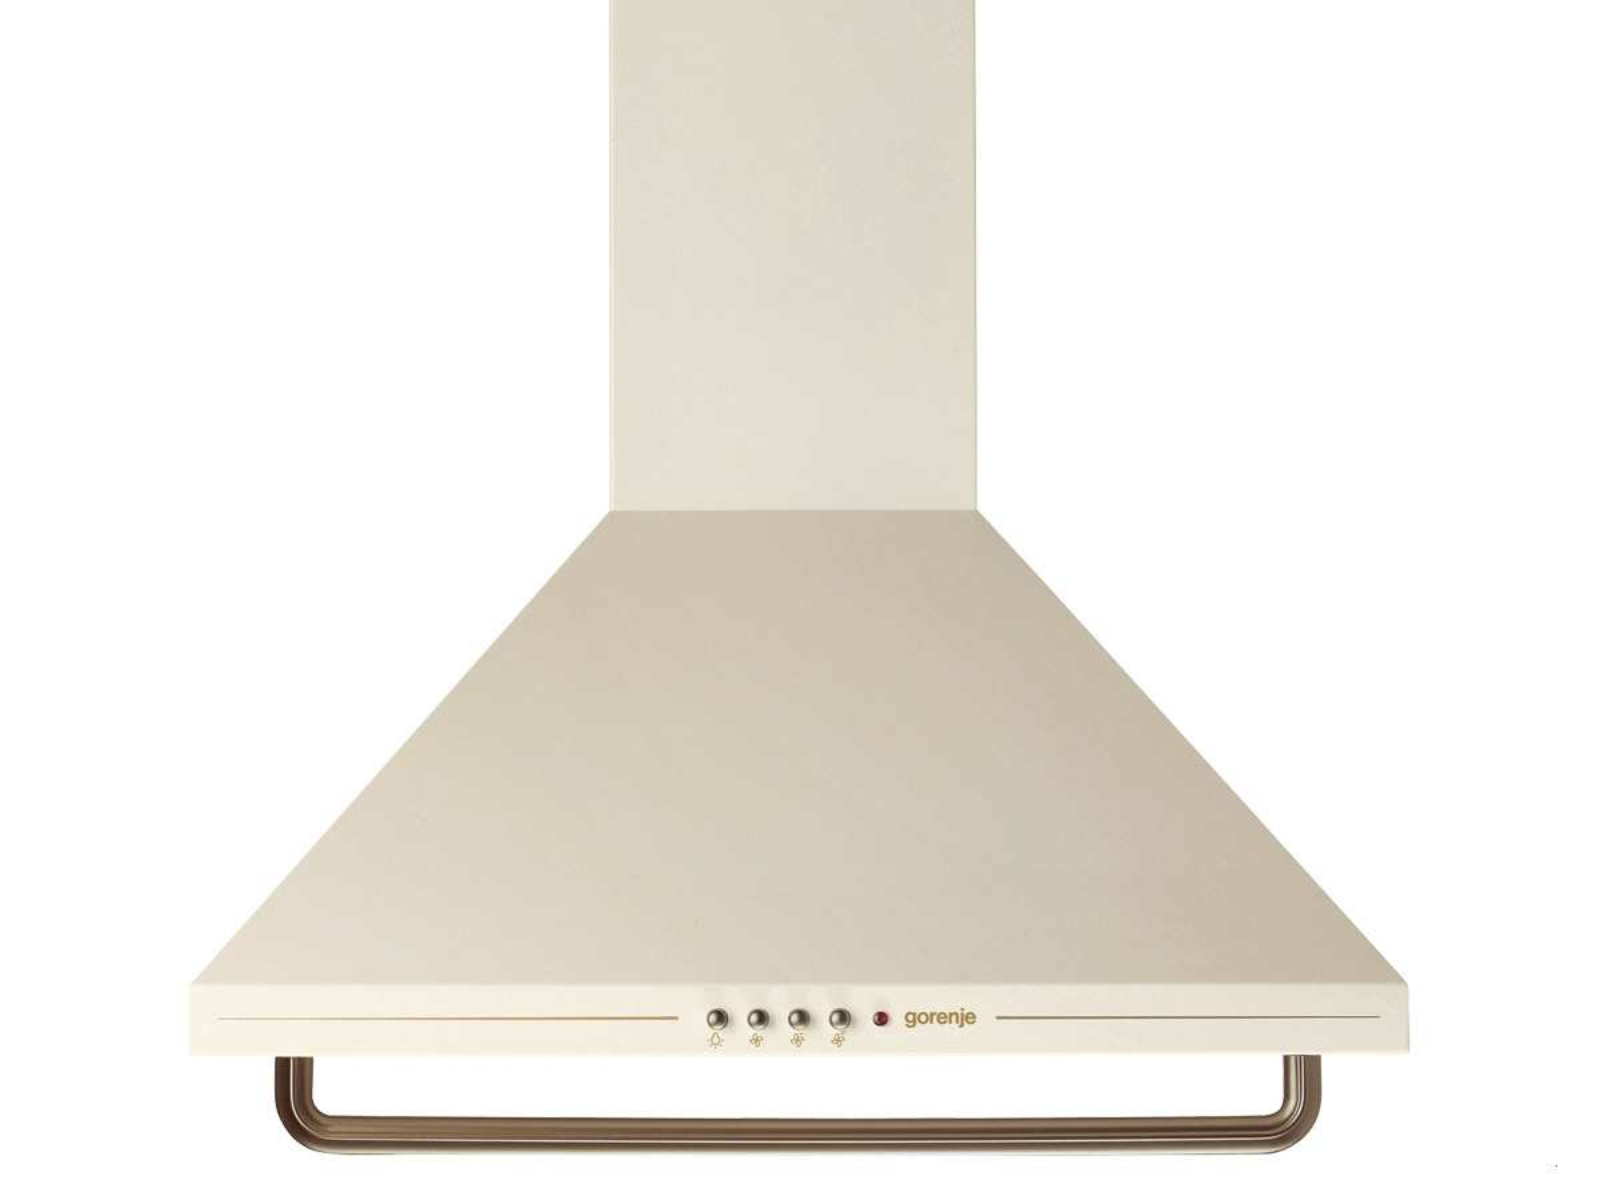 gorenje dk 63 cli classico wand dunstabzugshaube elfenbein f r 224 90 eur. Black Bedroom Furniture Sets. Home Design Ideas